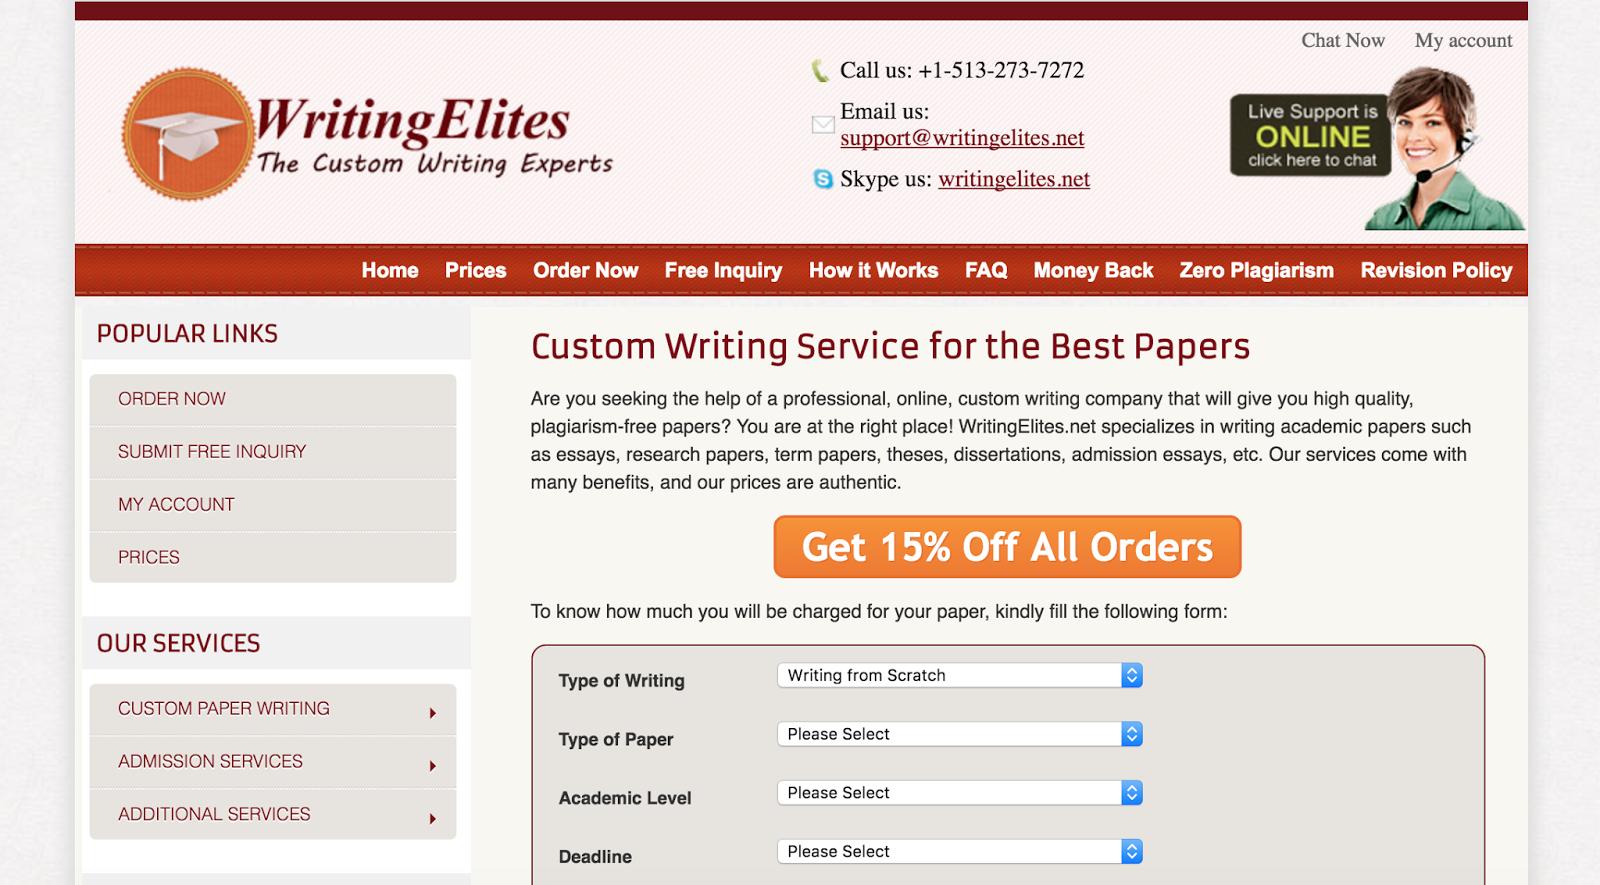 customwritting